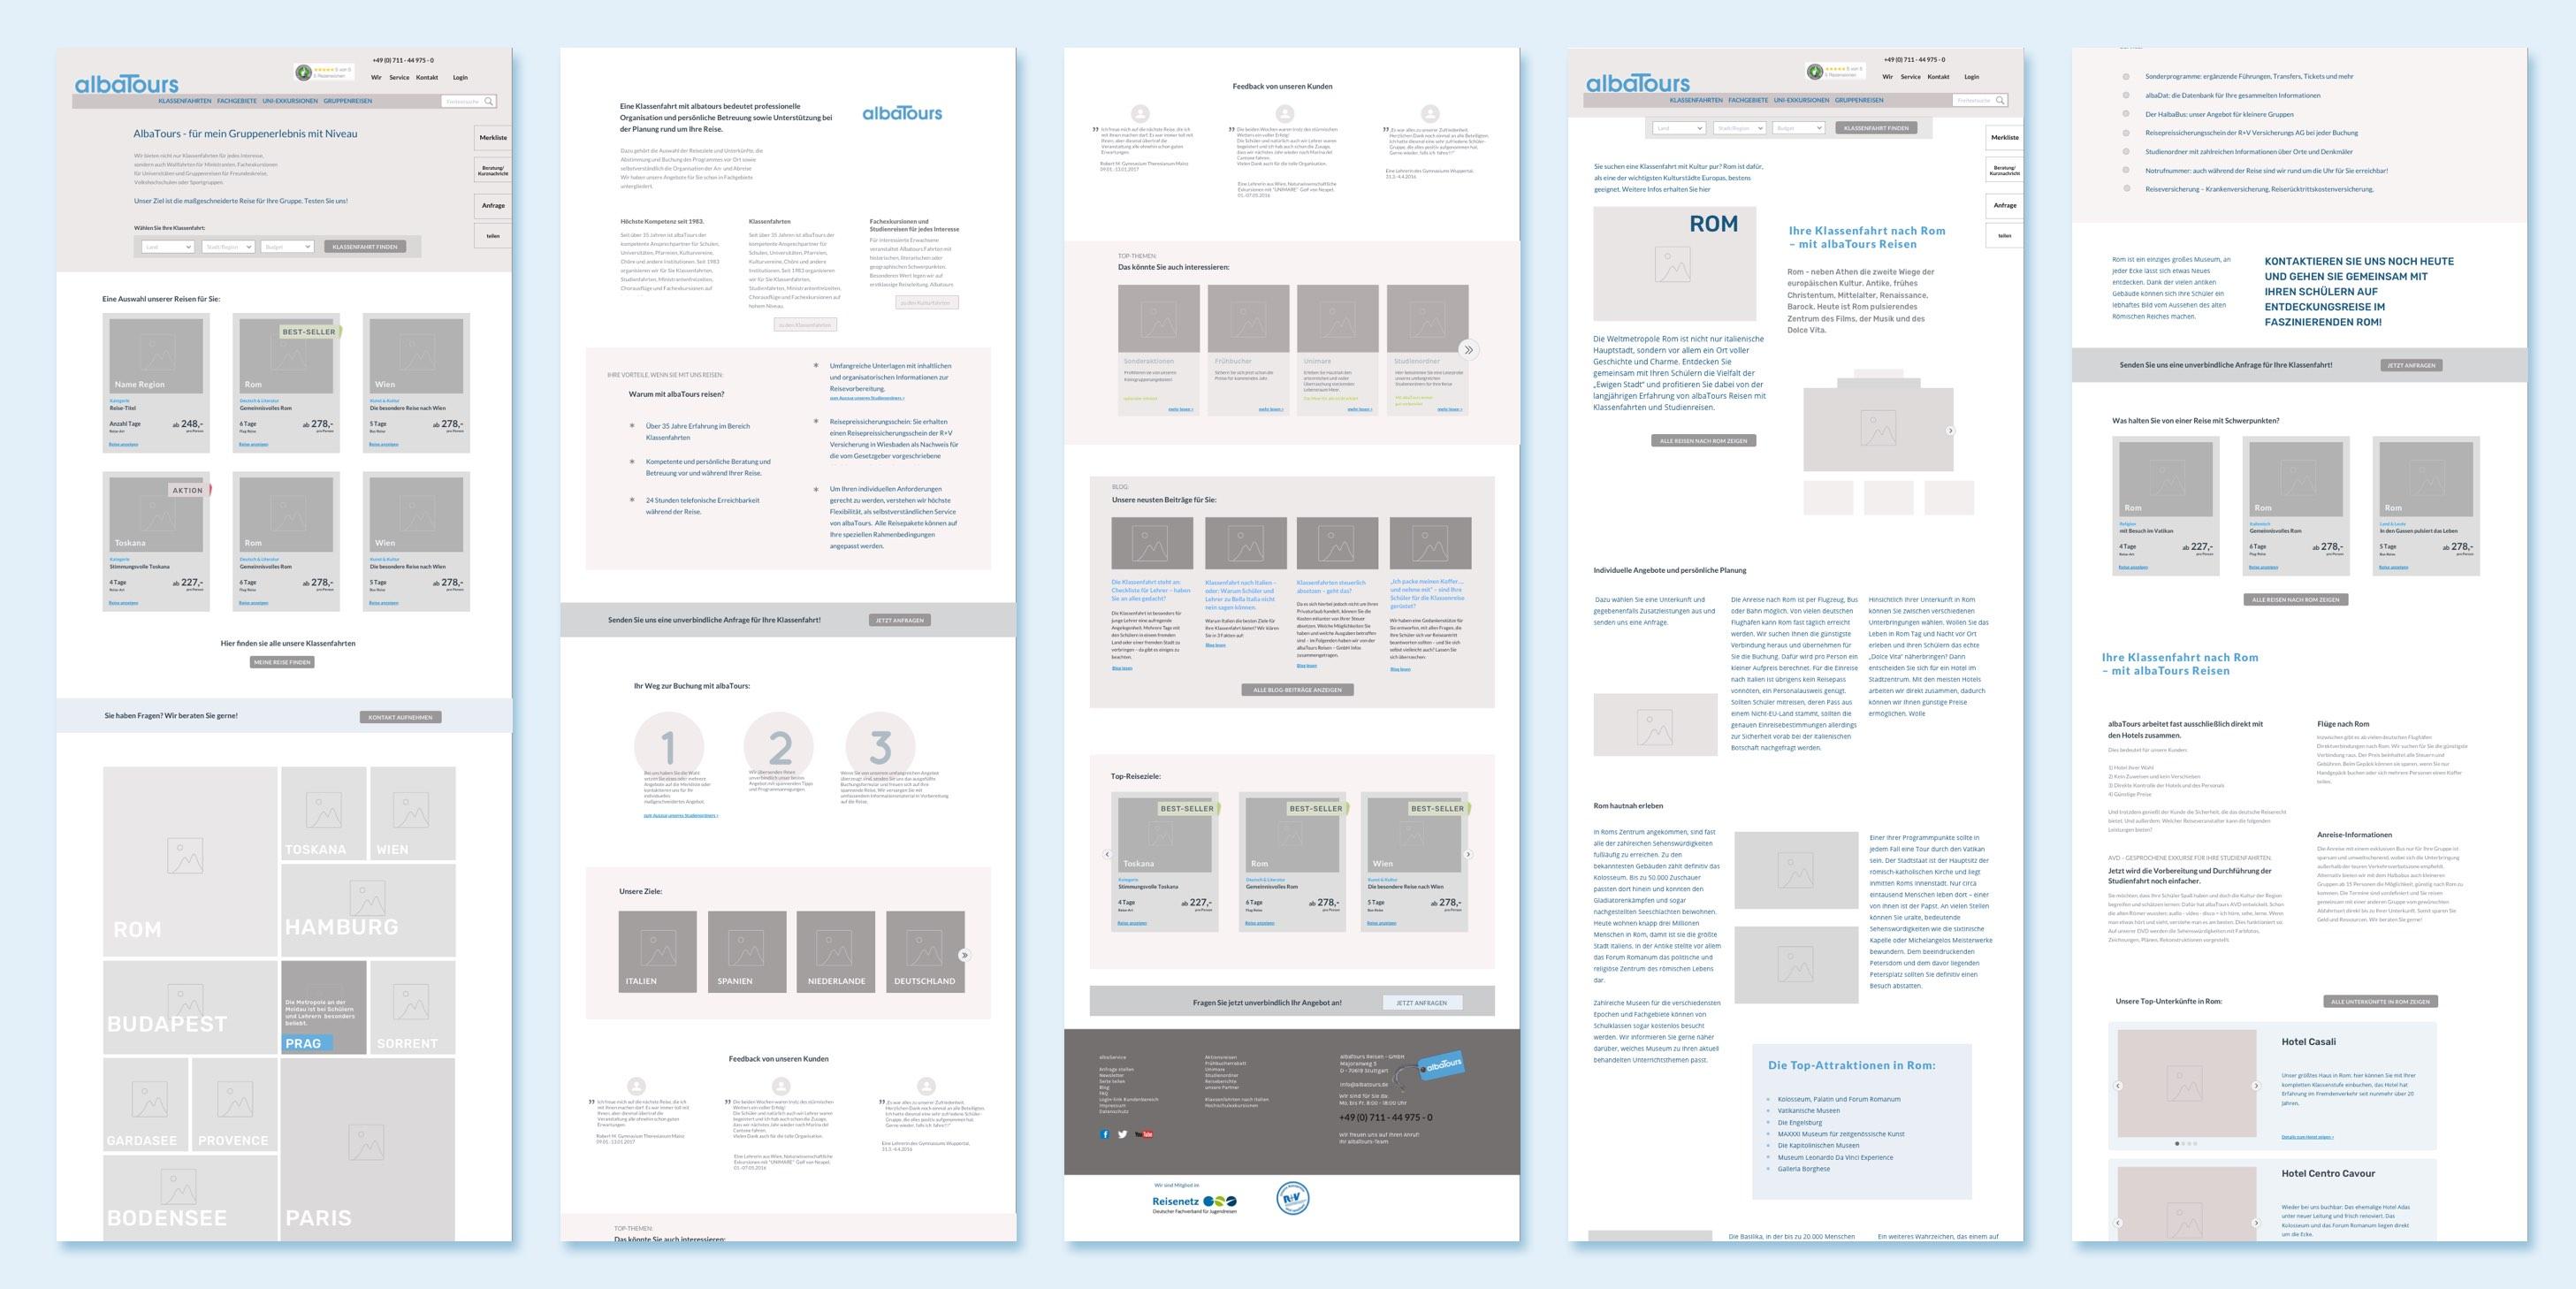 wireframes low fidelity mockup website design albtours